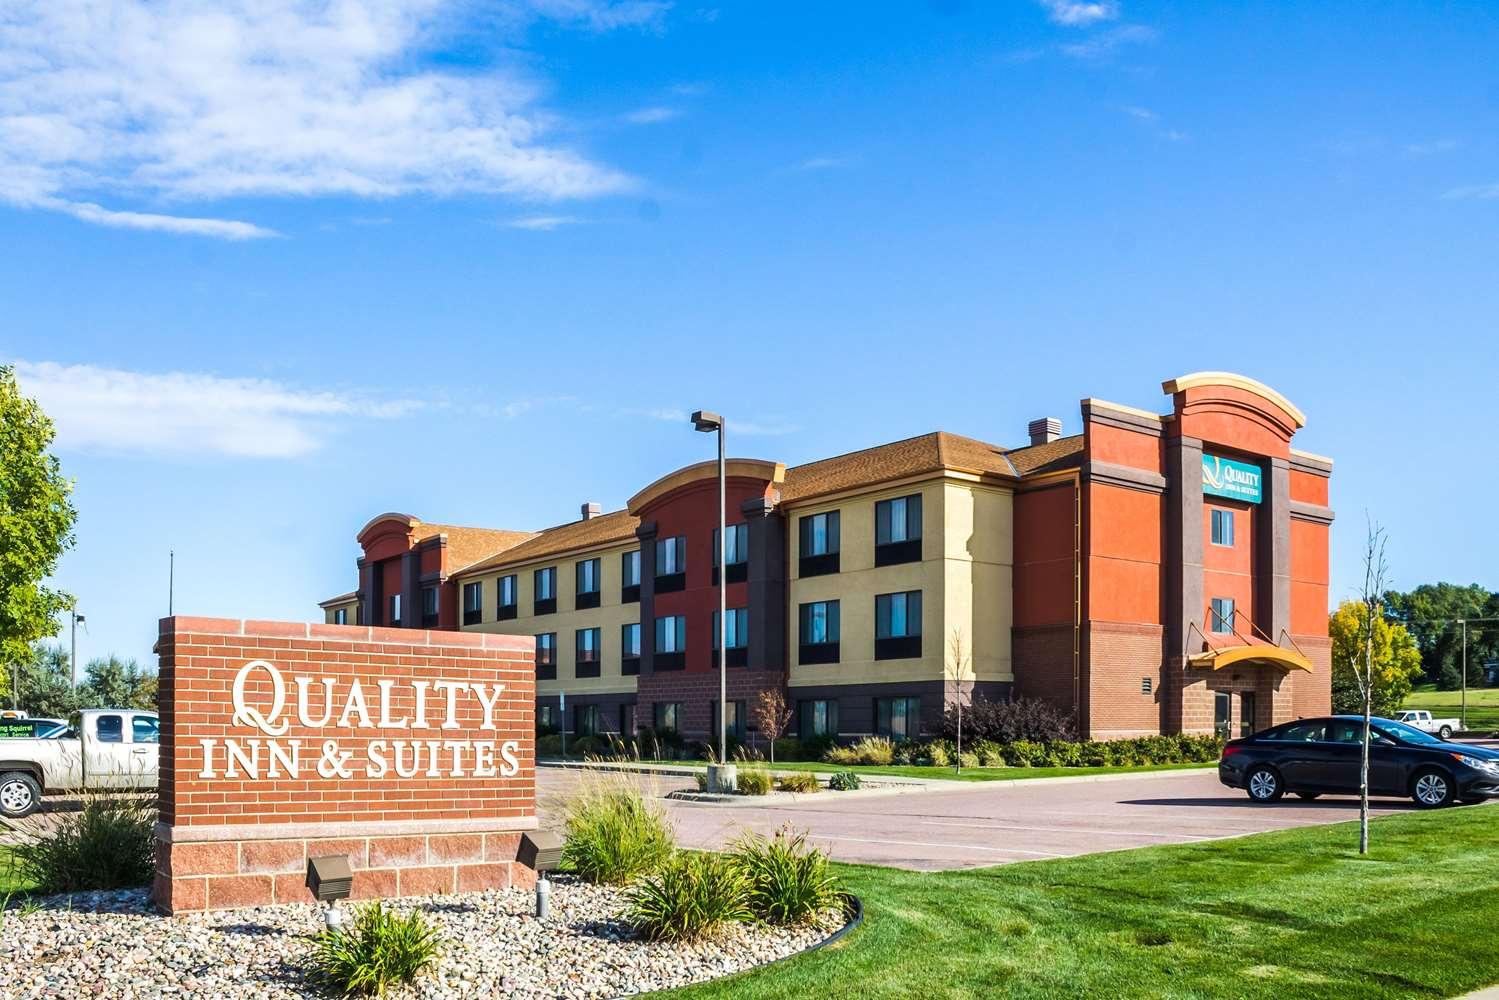 Exterior view - Quality Inn & Suites Sioux Falls